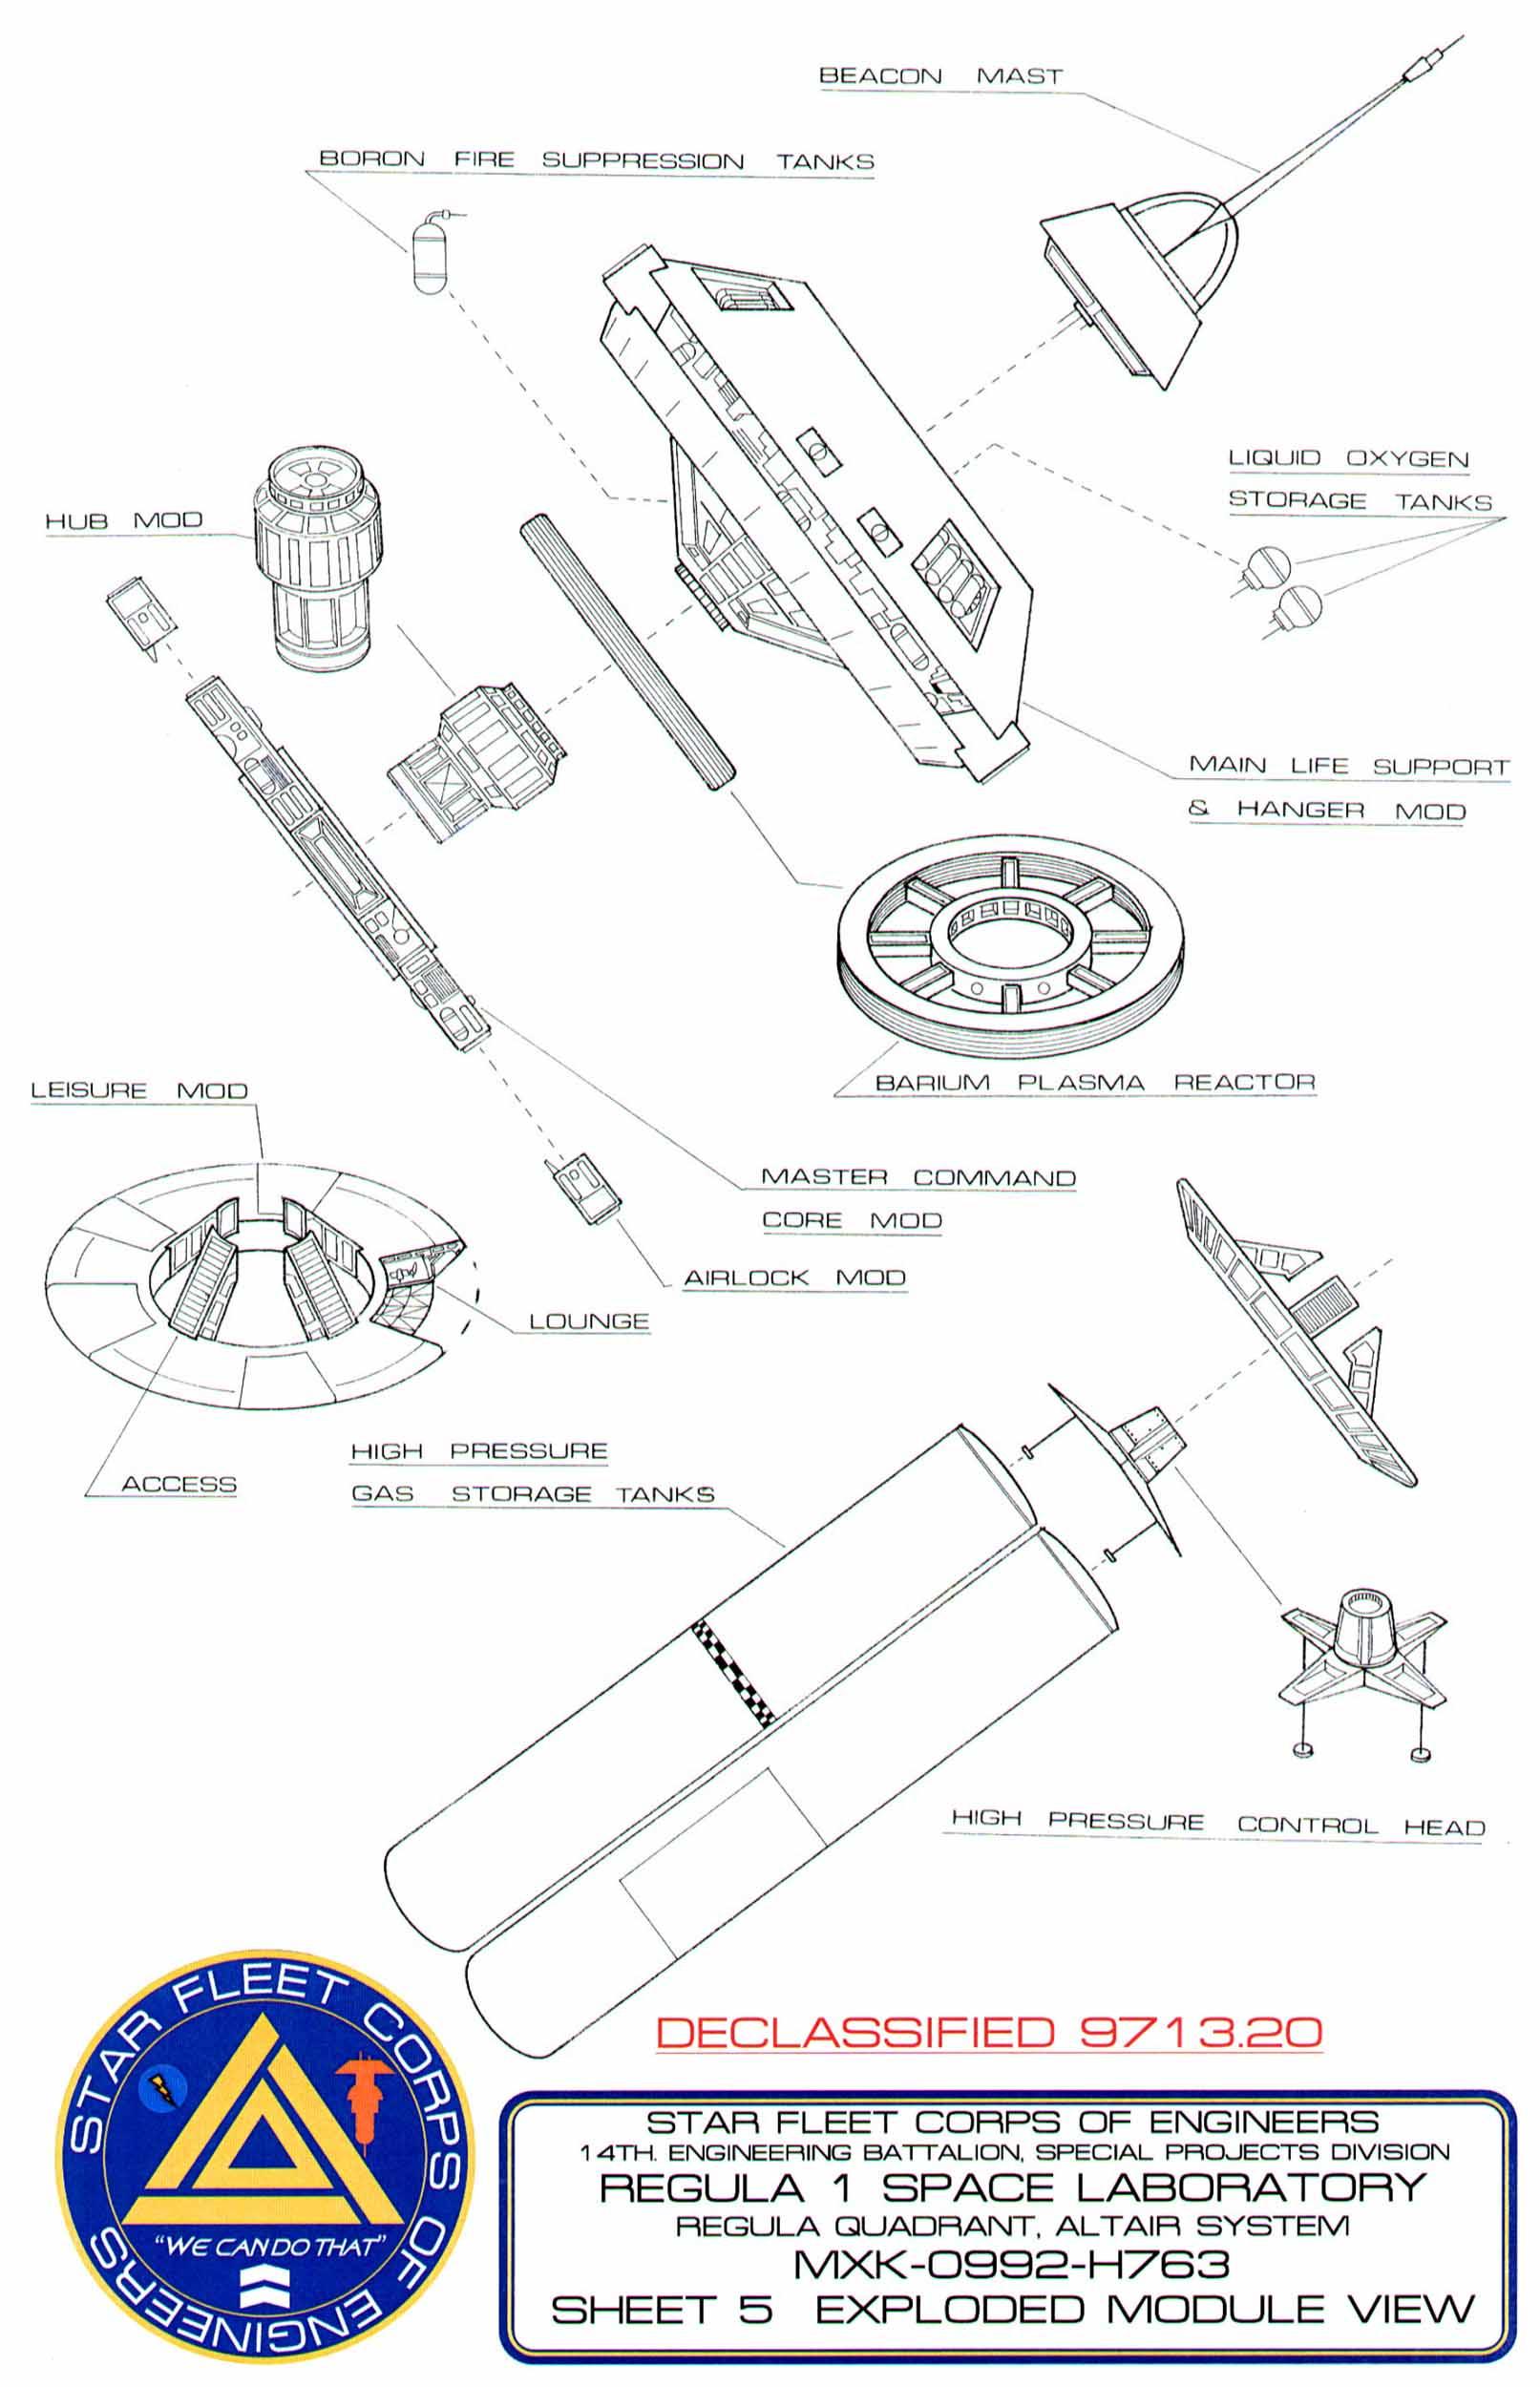 spacelaboratoryregula1sheet5.jpg